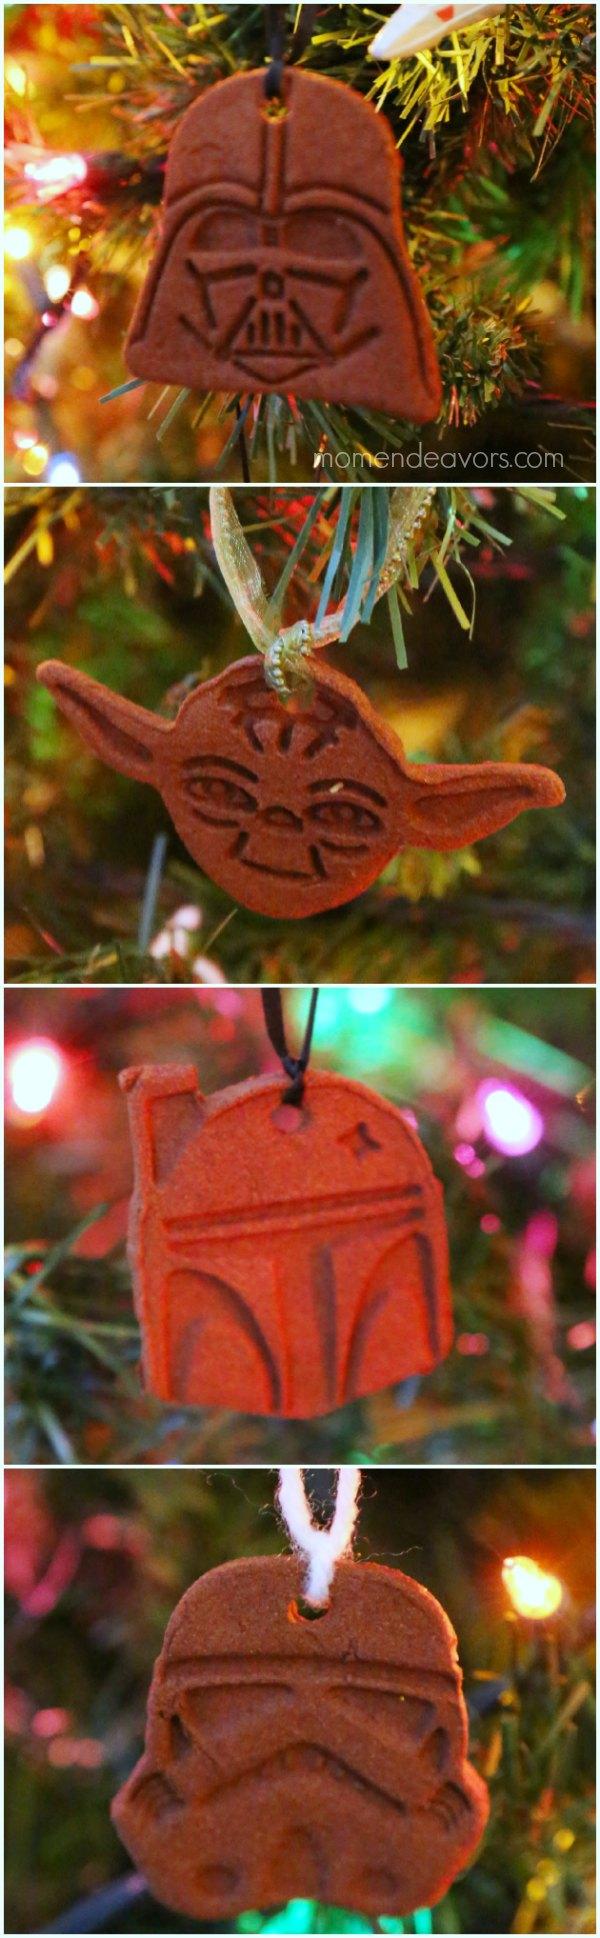 Homemade Star Wars Ornaments